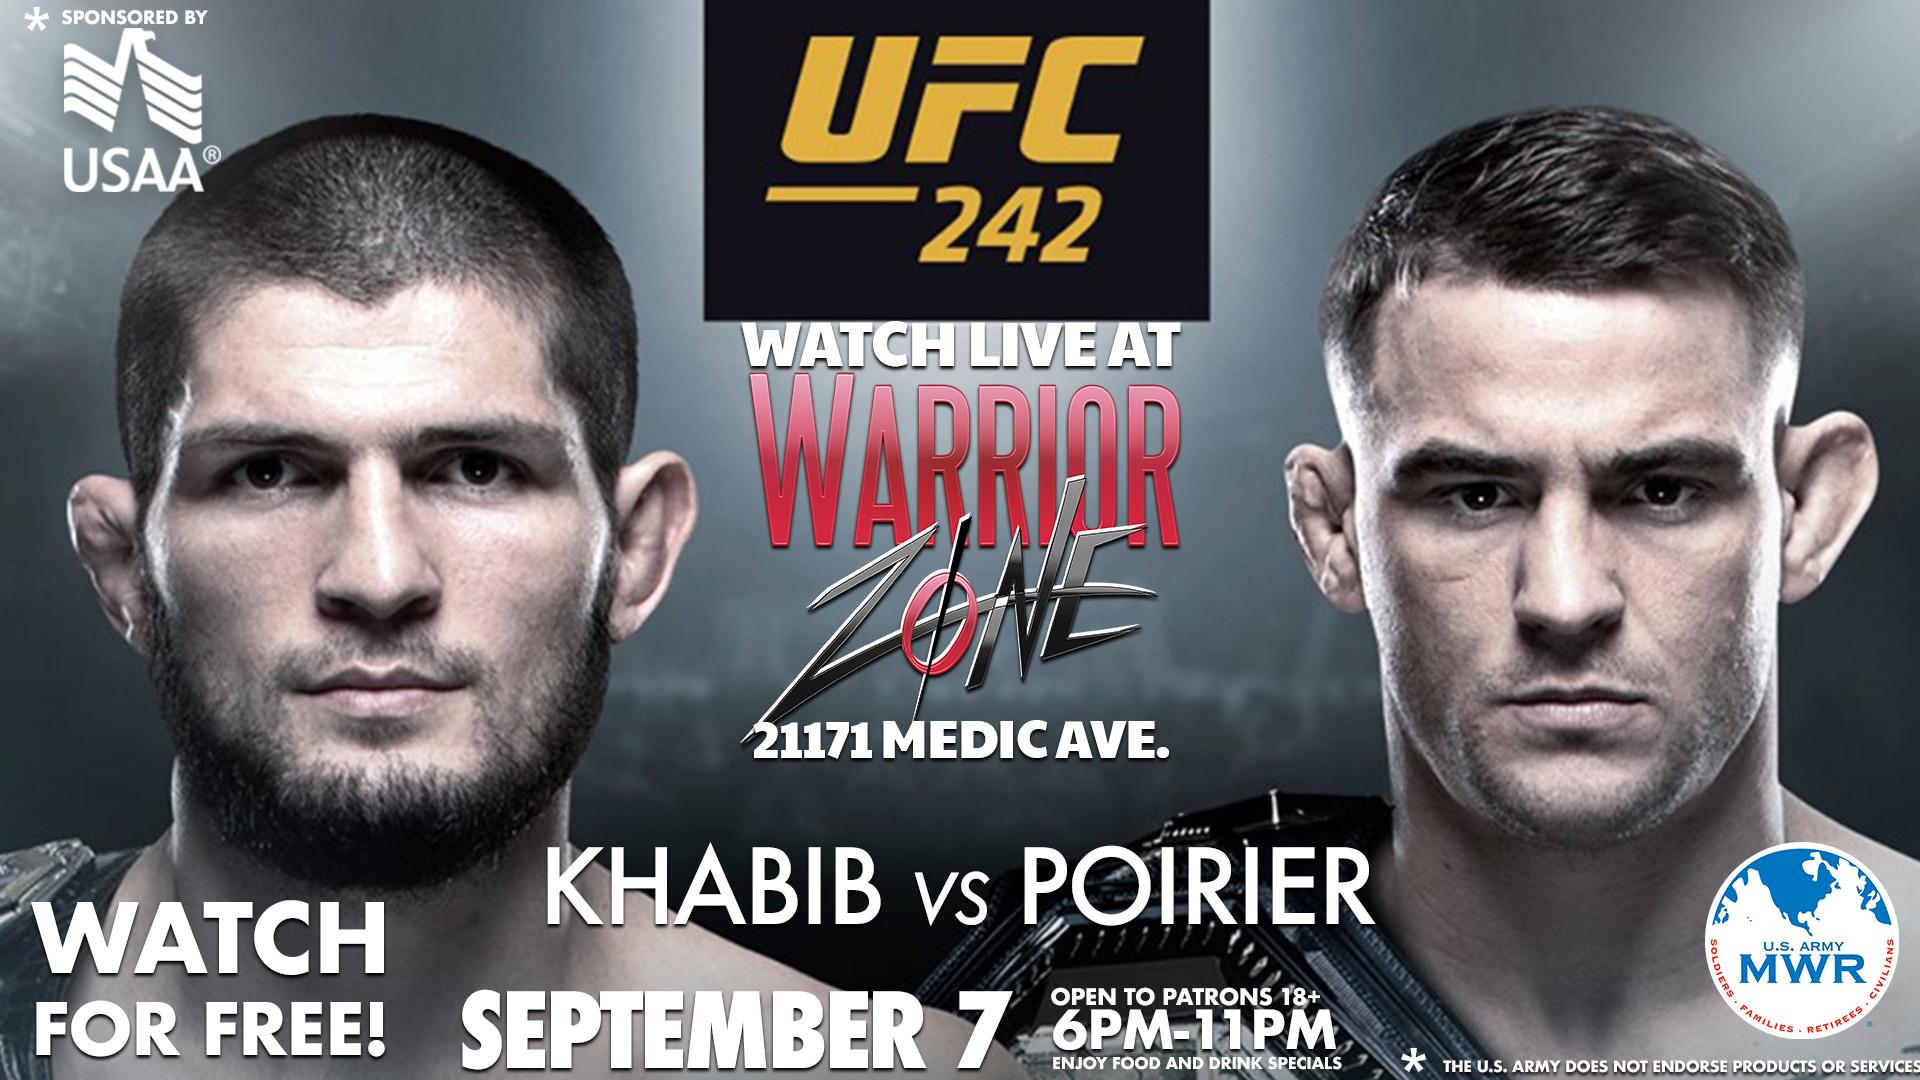 UFC Fight 242